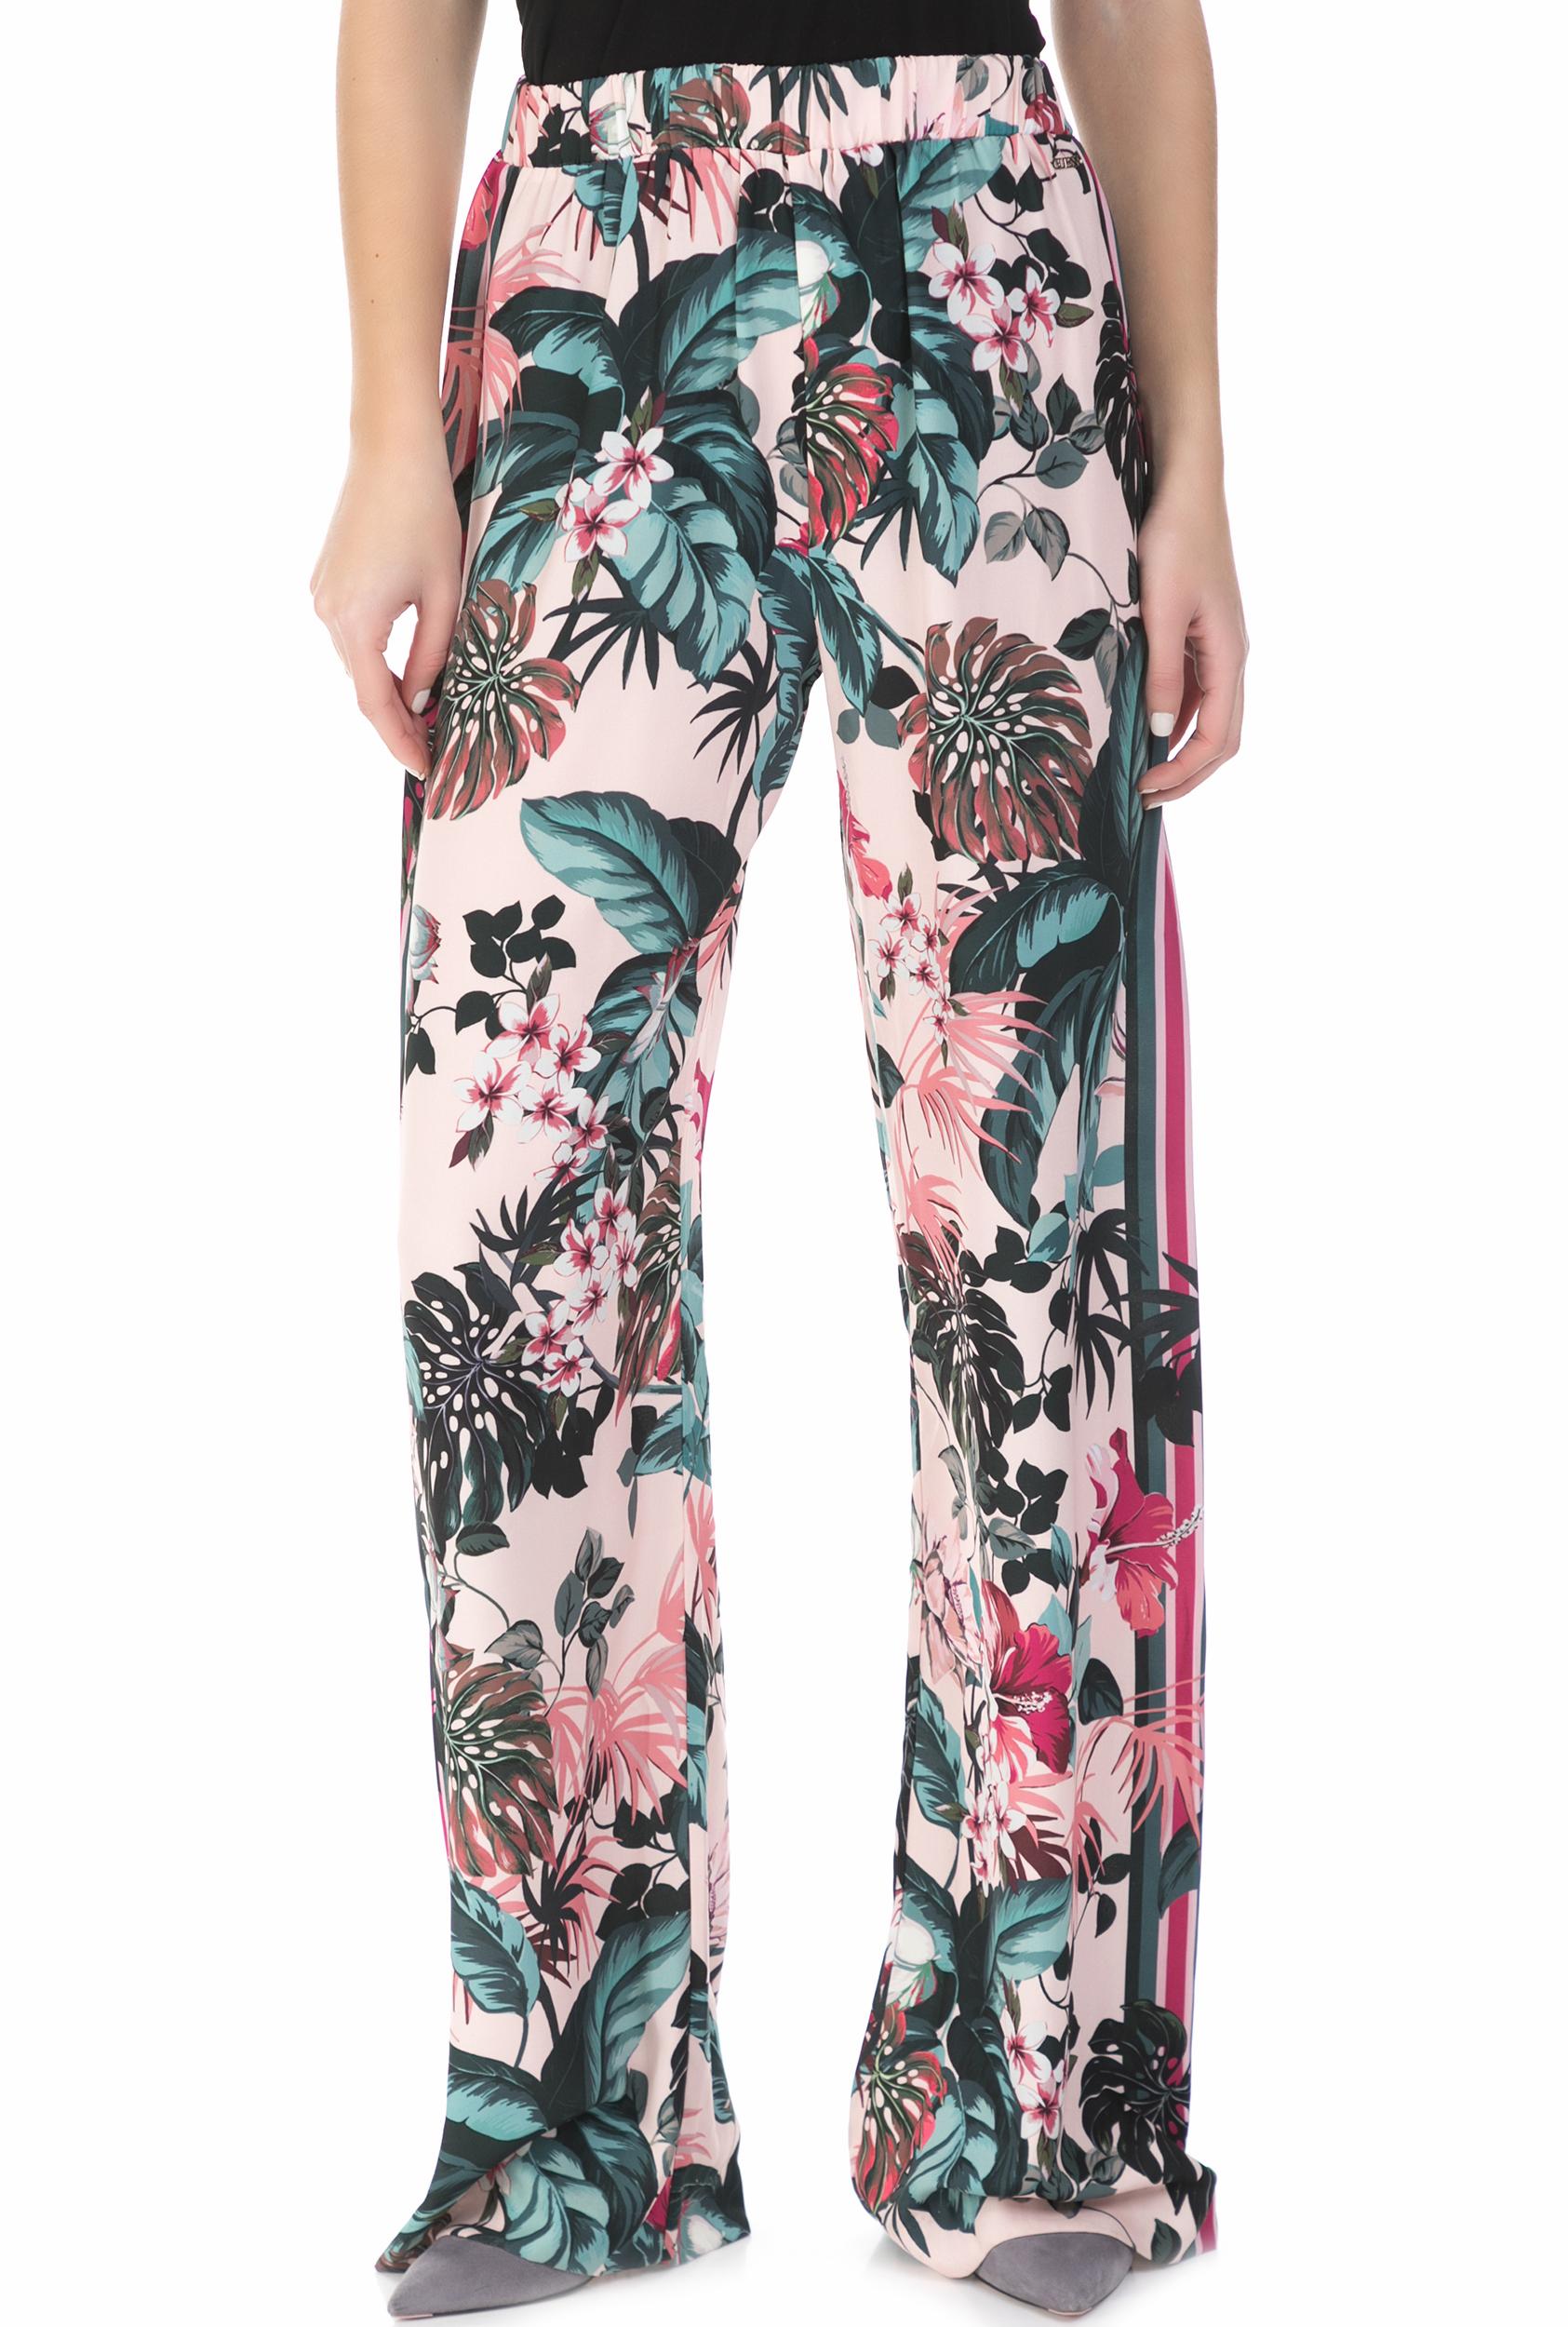 c97b65599d1c GUESS - Γυναικεία παντελόνα ERNESTINE PANTS GUESS φλοράλ